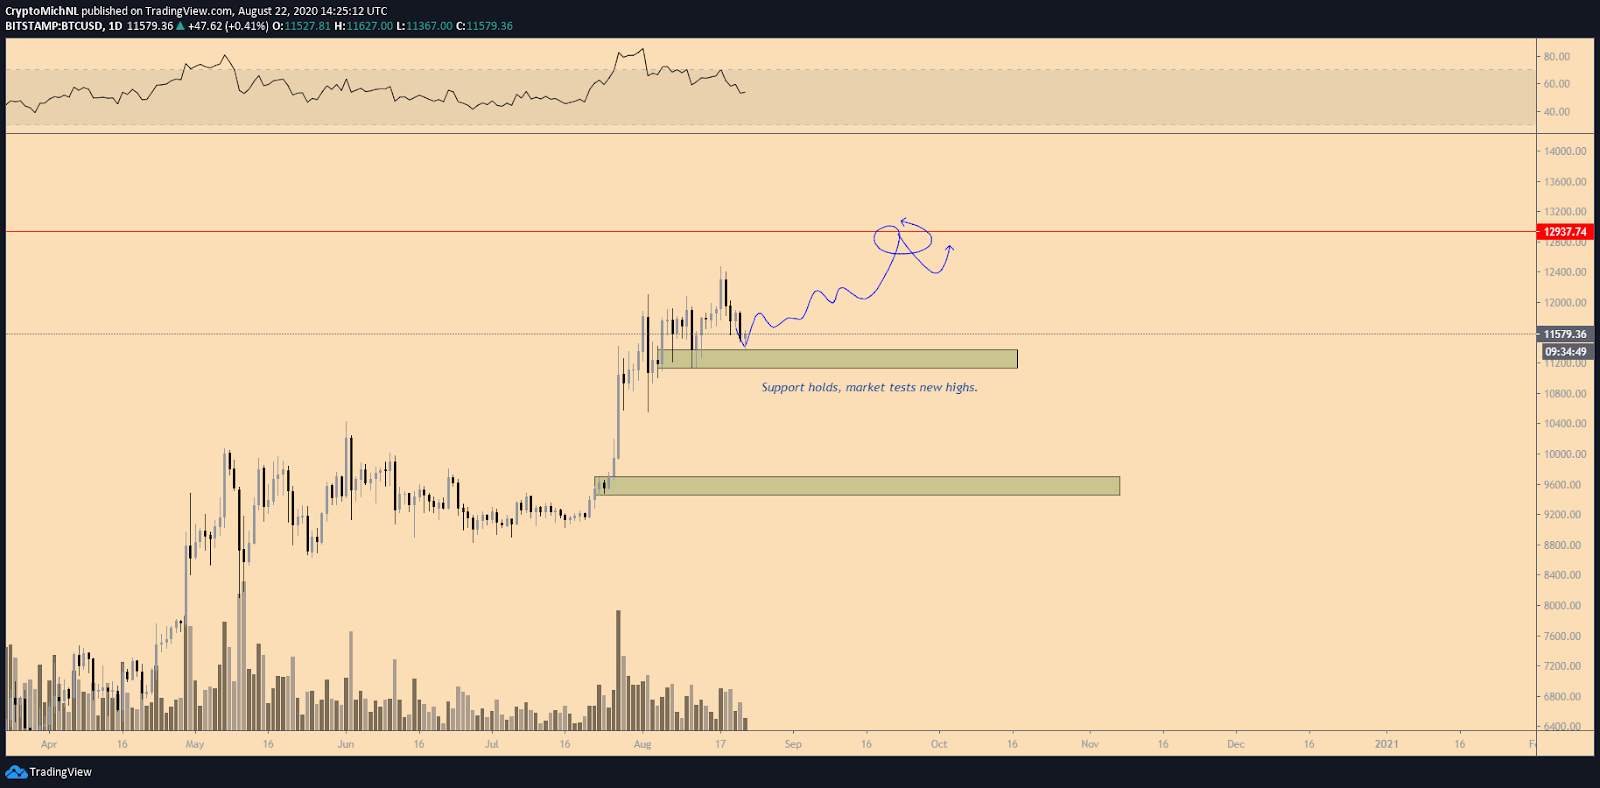 BTC/USDT bullish scenario chart. Source: TradingView